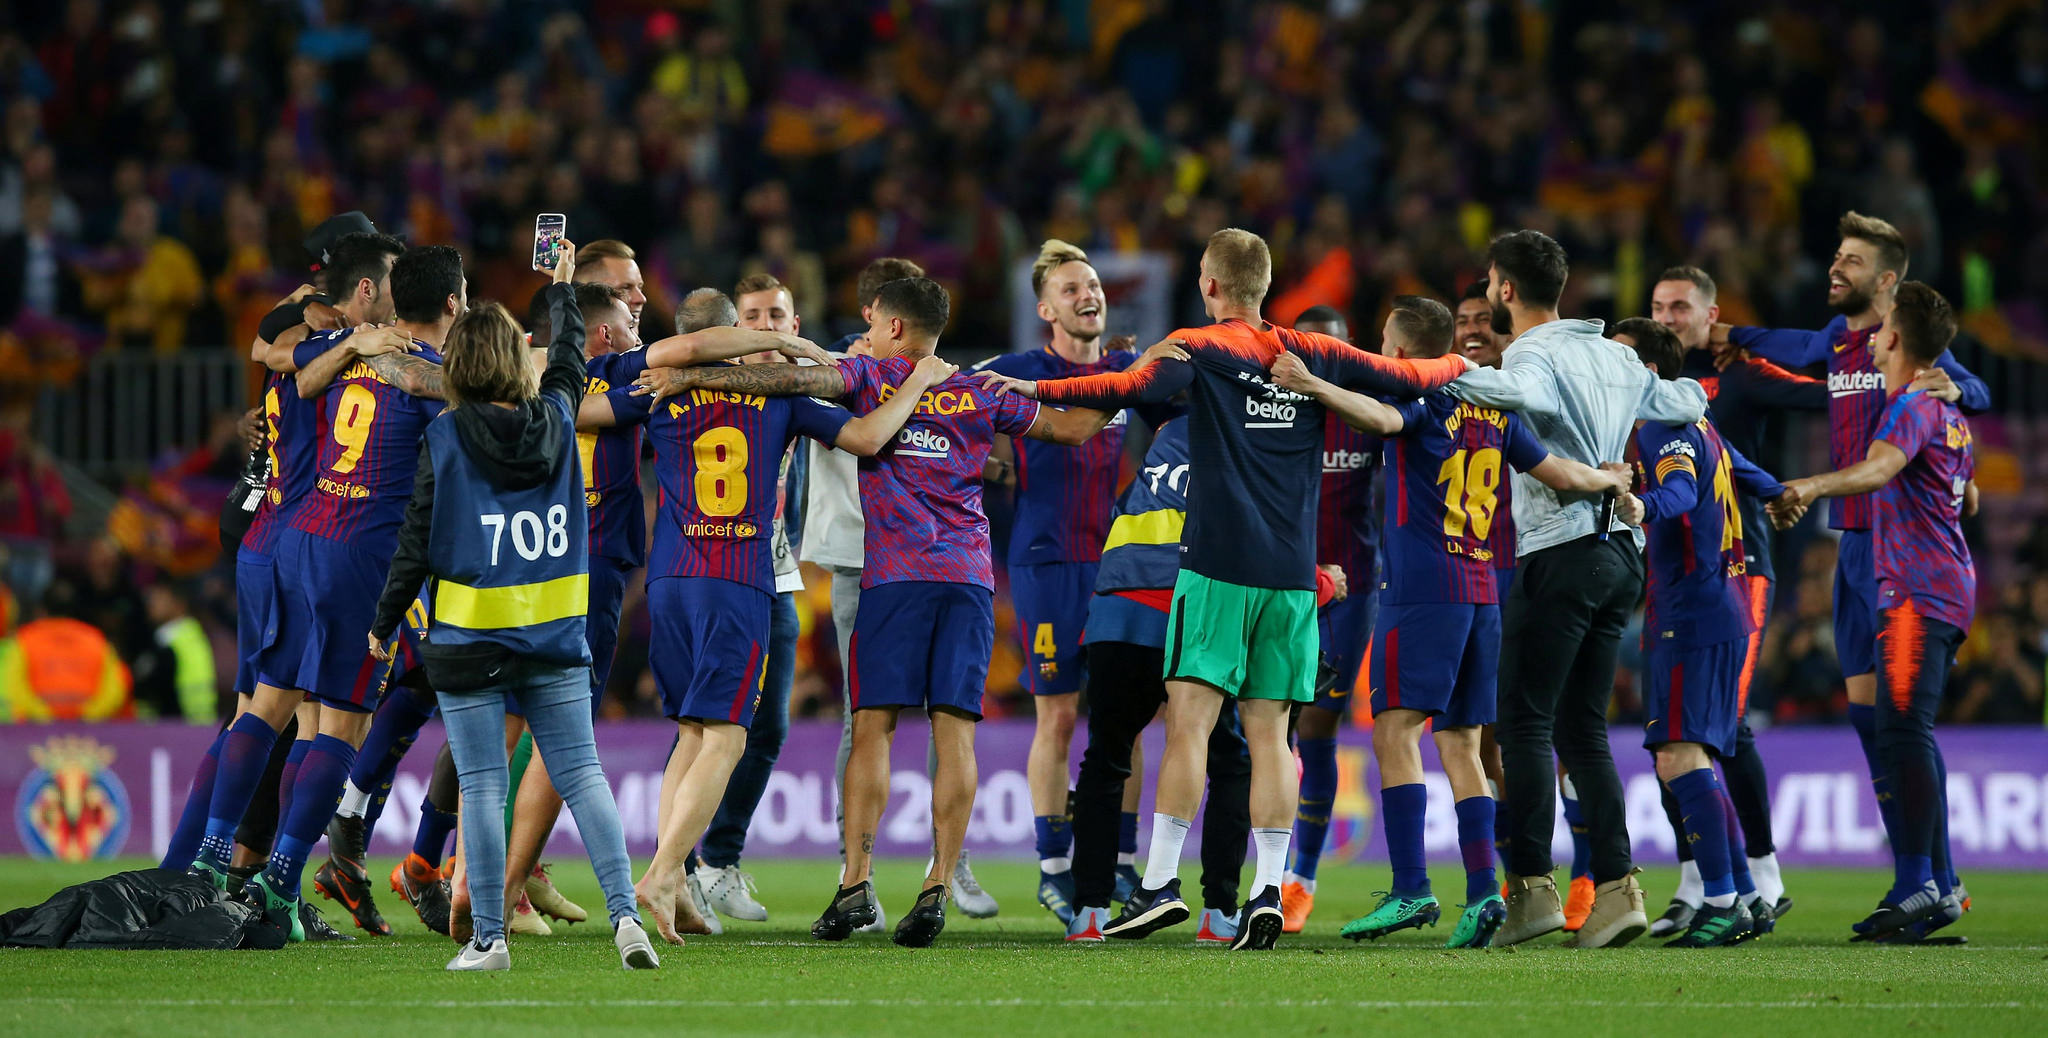 FC Barcelona 2018-19 Season Preview - TSJ101 Sports!